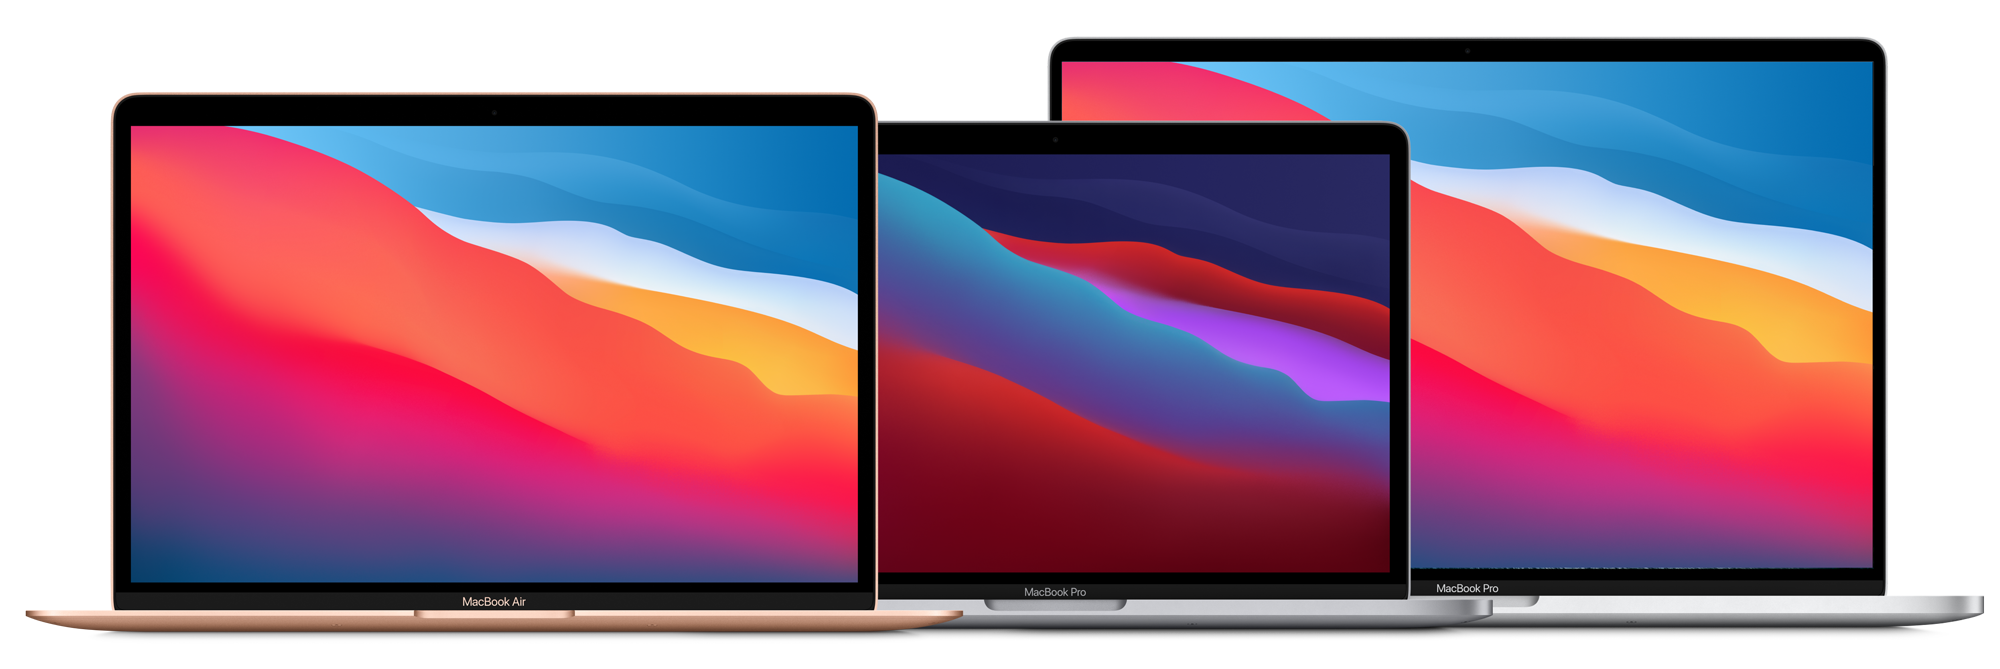 Mac zBeats Flex